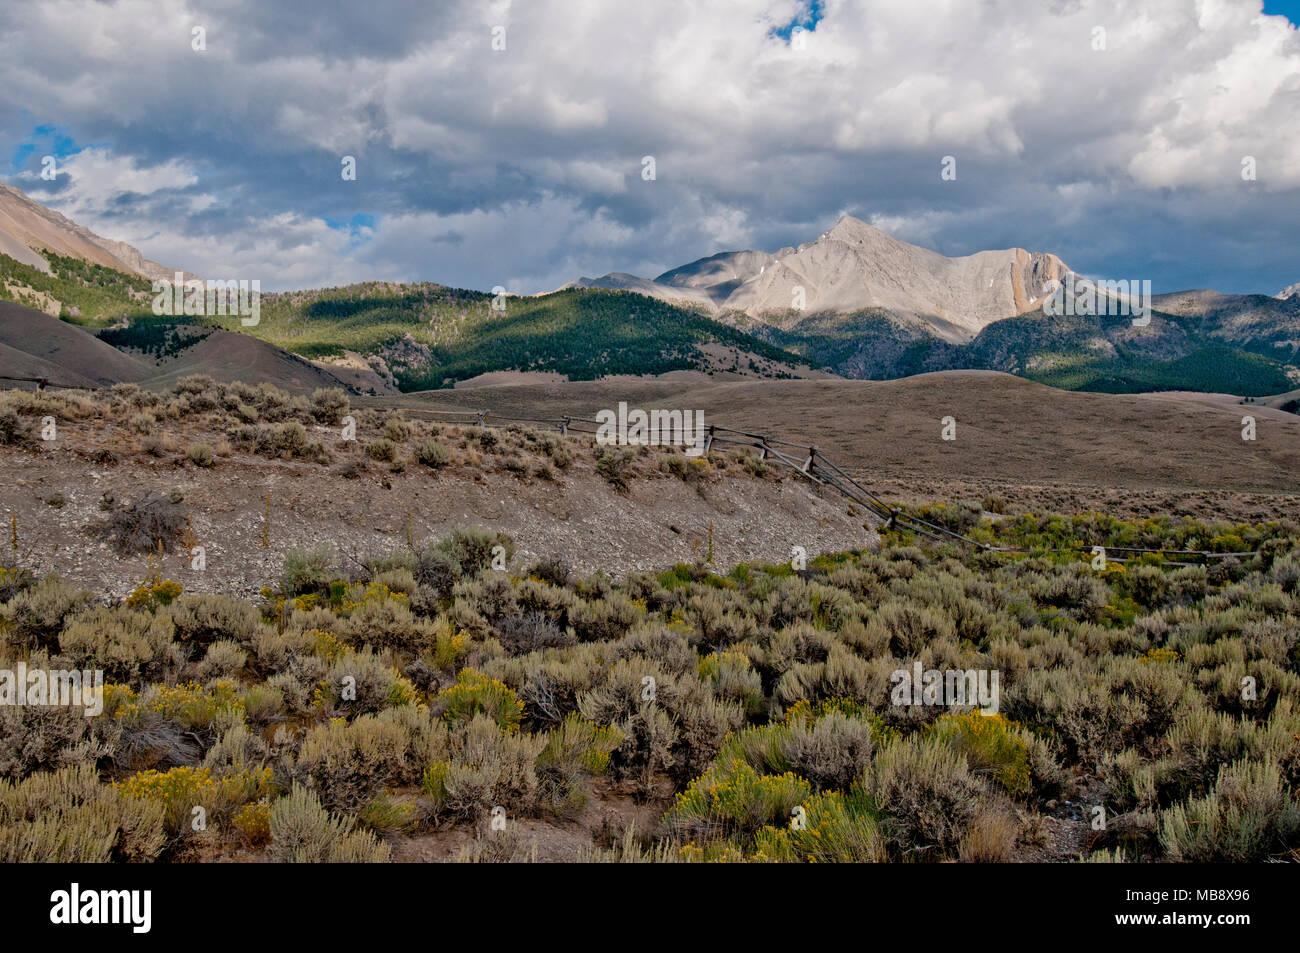 Mount Borah 21-mile-long earthquake scarp with Mount Borah in the background - Stock Image